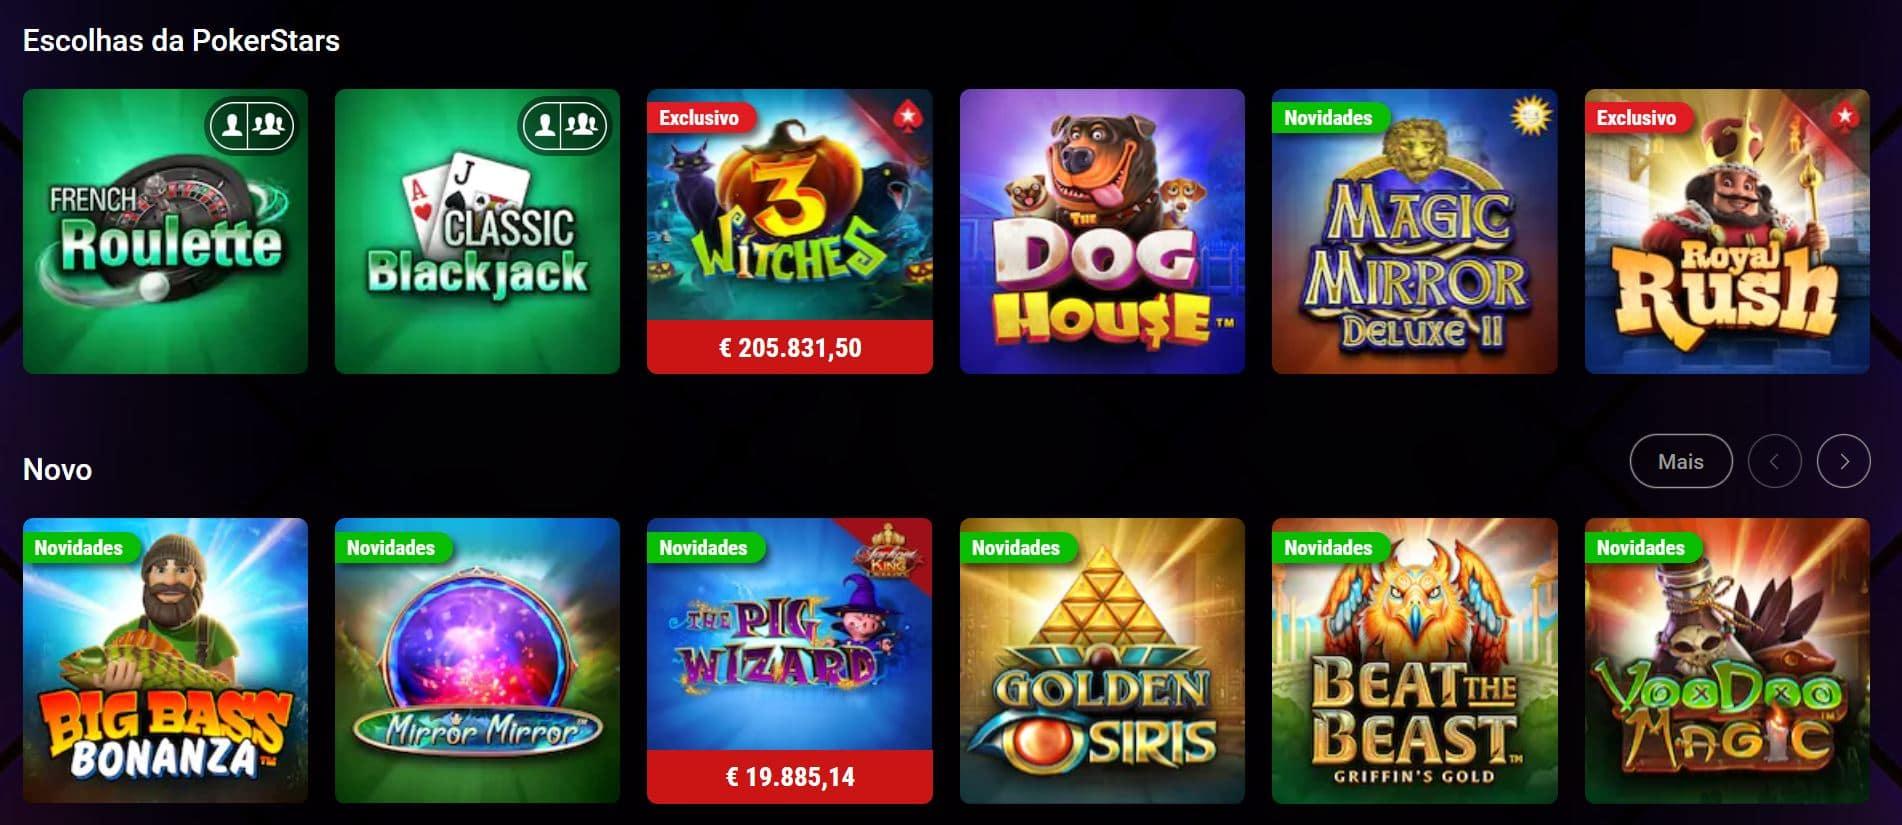 Jogos disponíveis no Pokerstars Casino